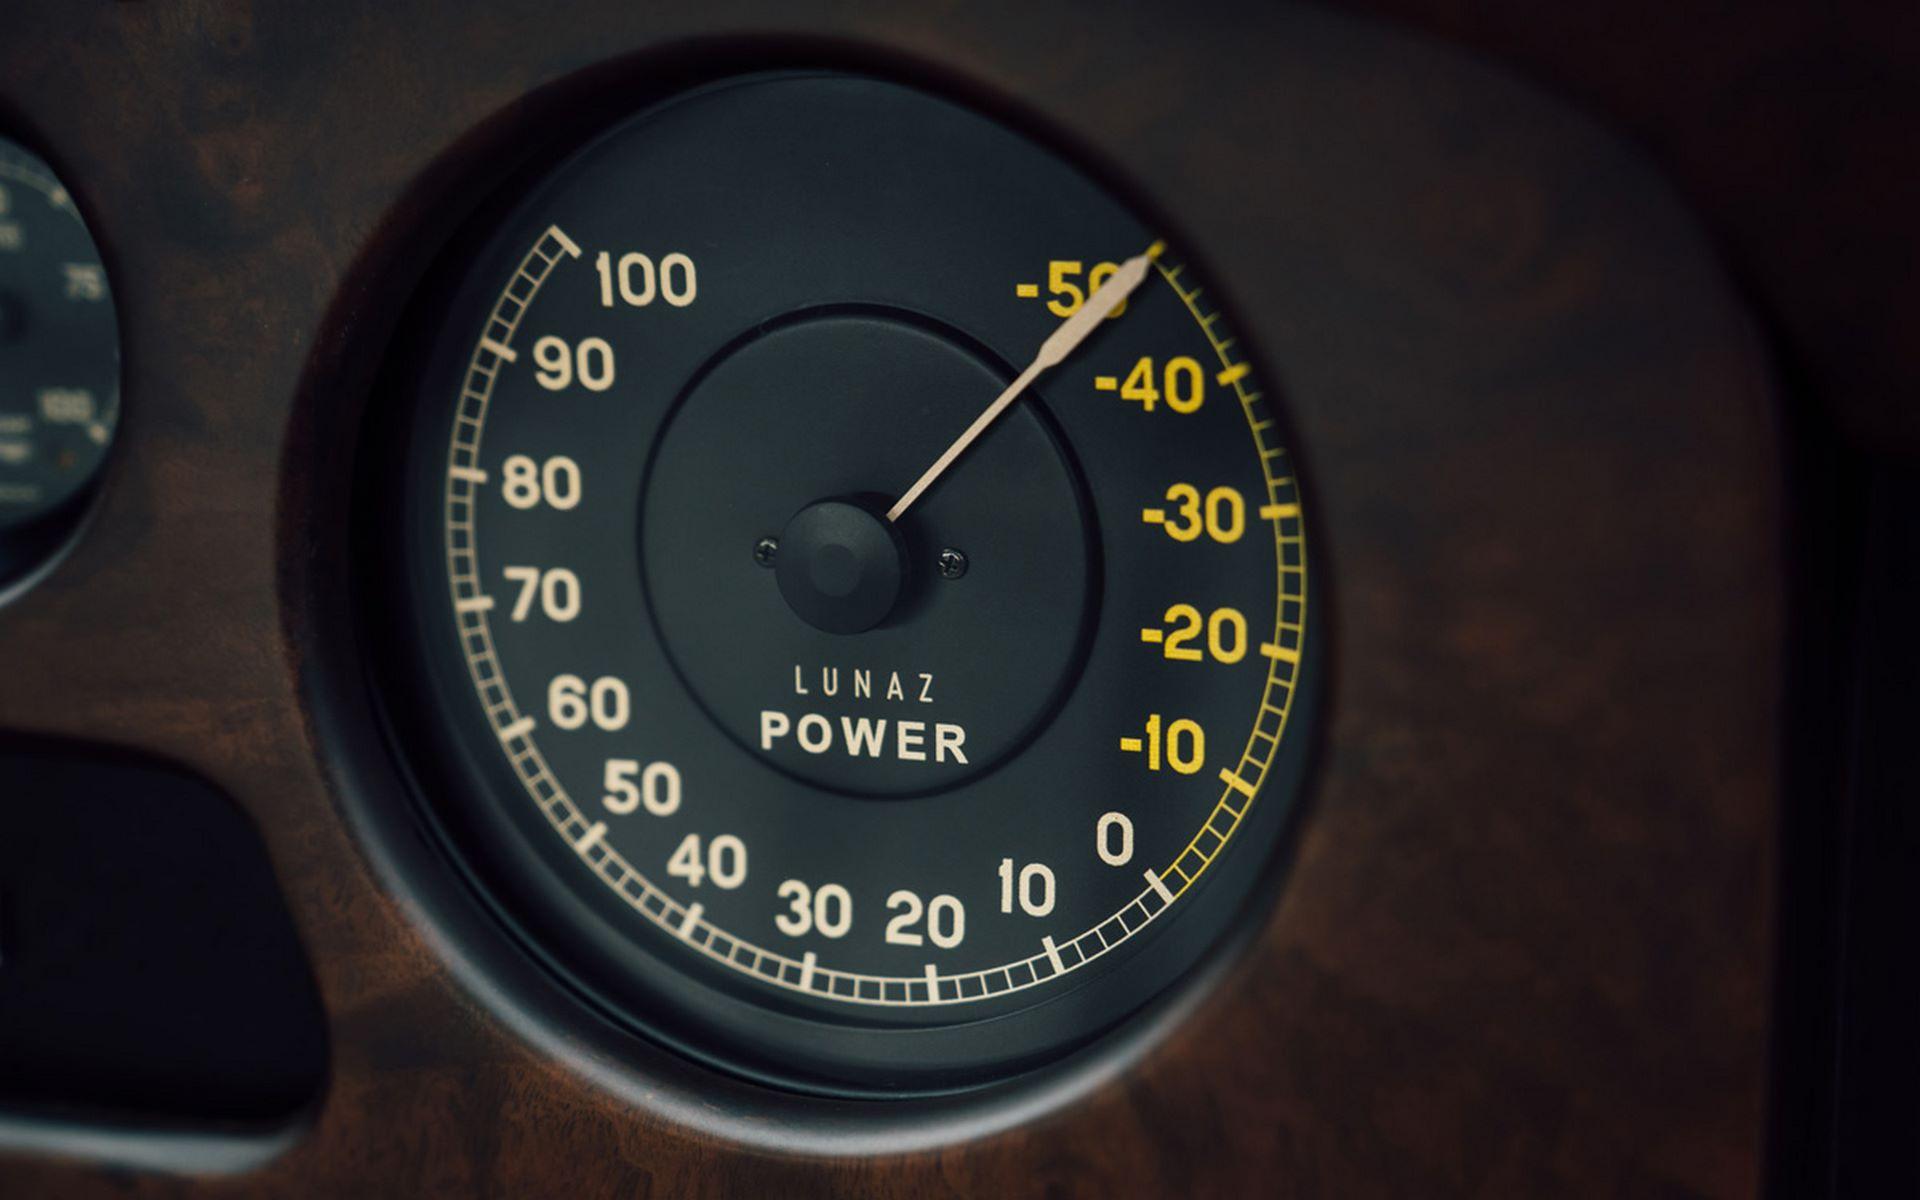 Electris-Rolls-Royce-Phantom-V-and-Silver-Cloud-by-Lunaz-26